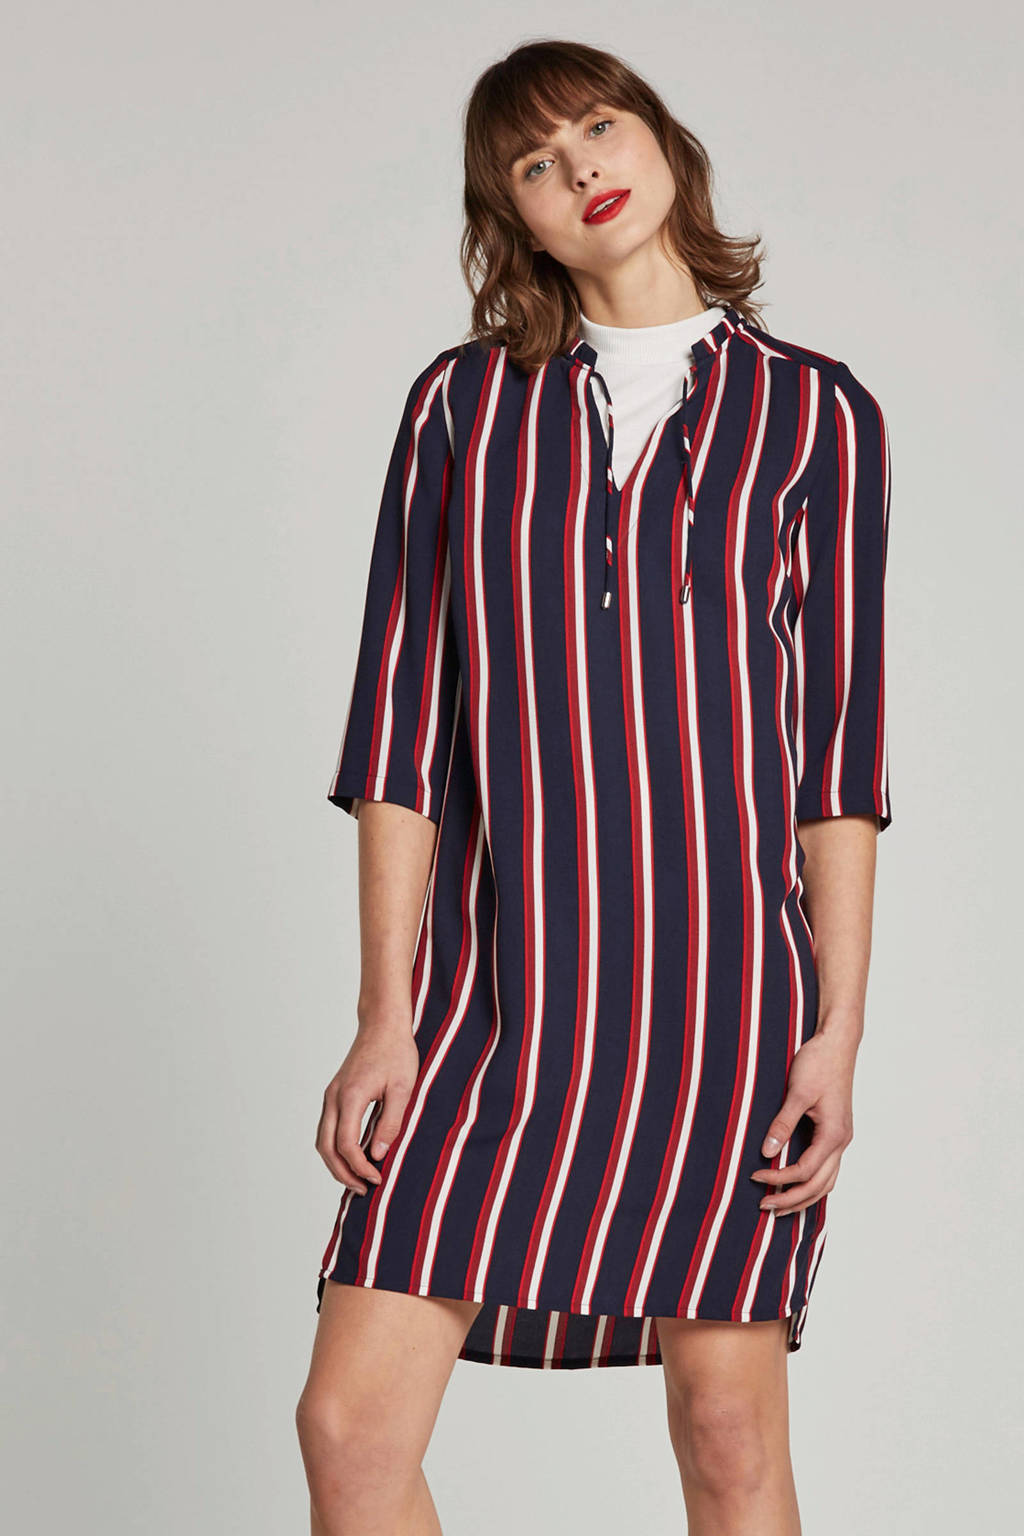 whkmp's own jurk met streepprint, Donkerblauw/rood/ecru